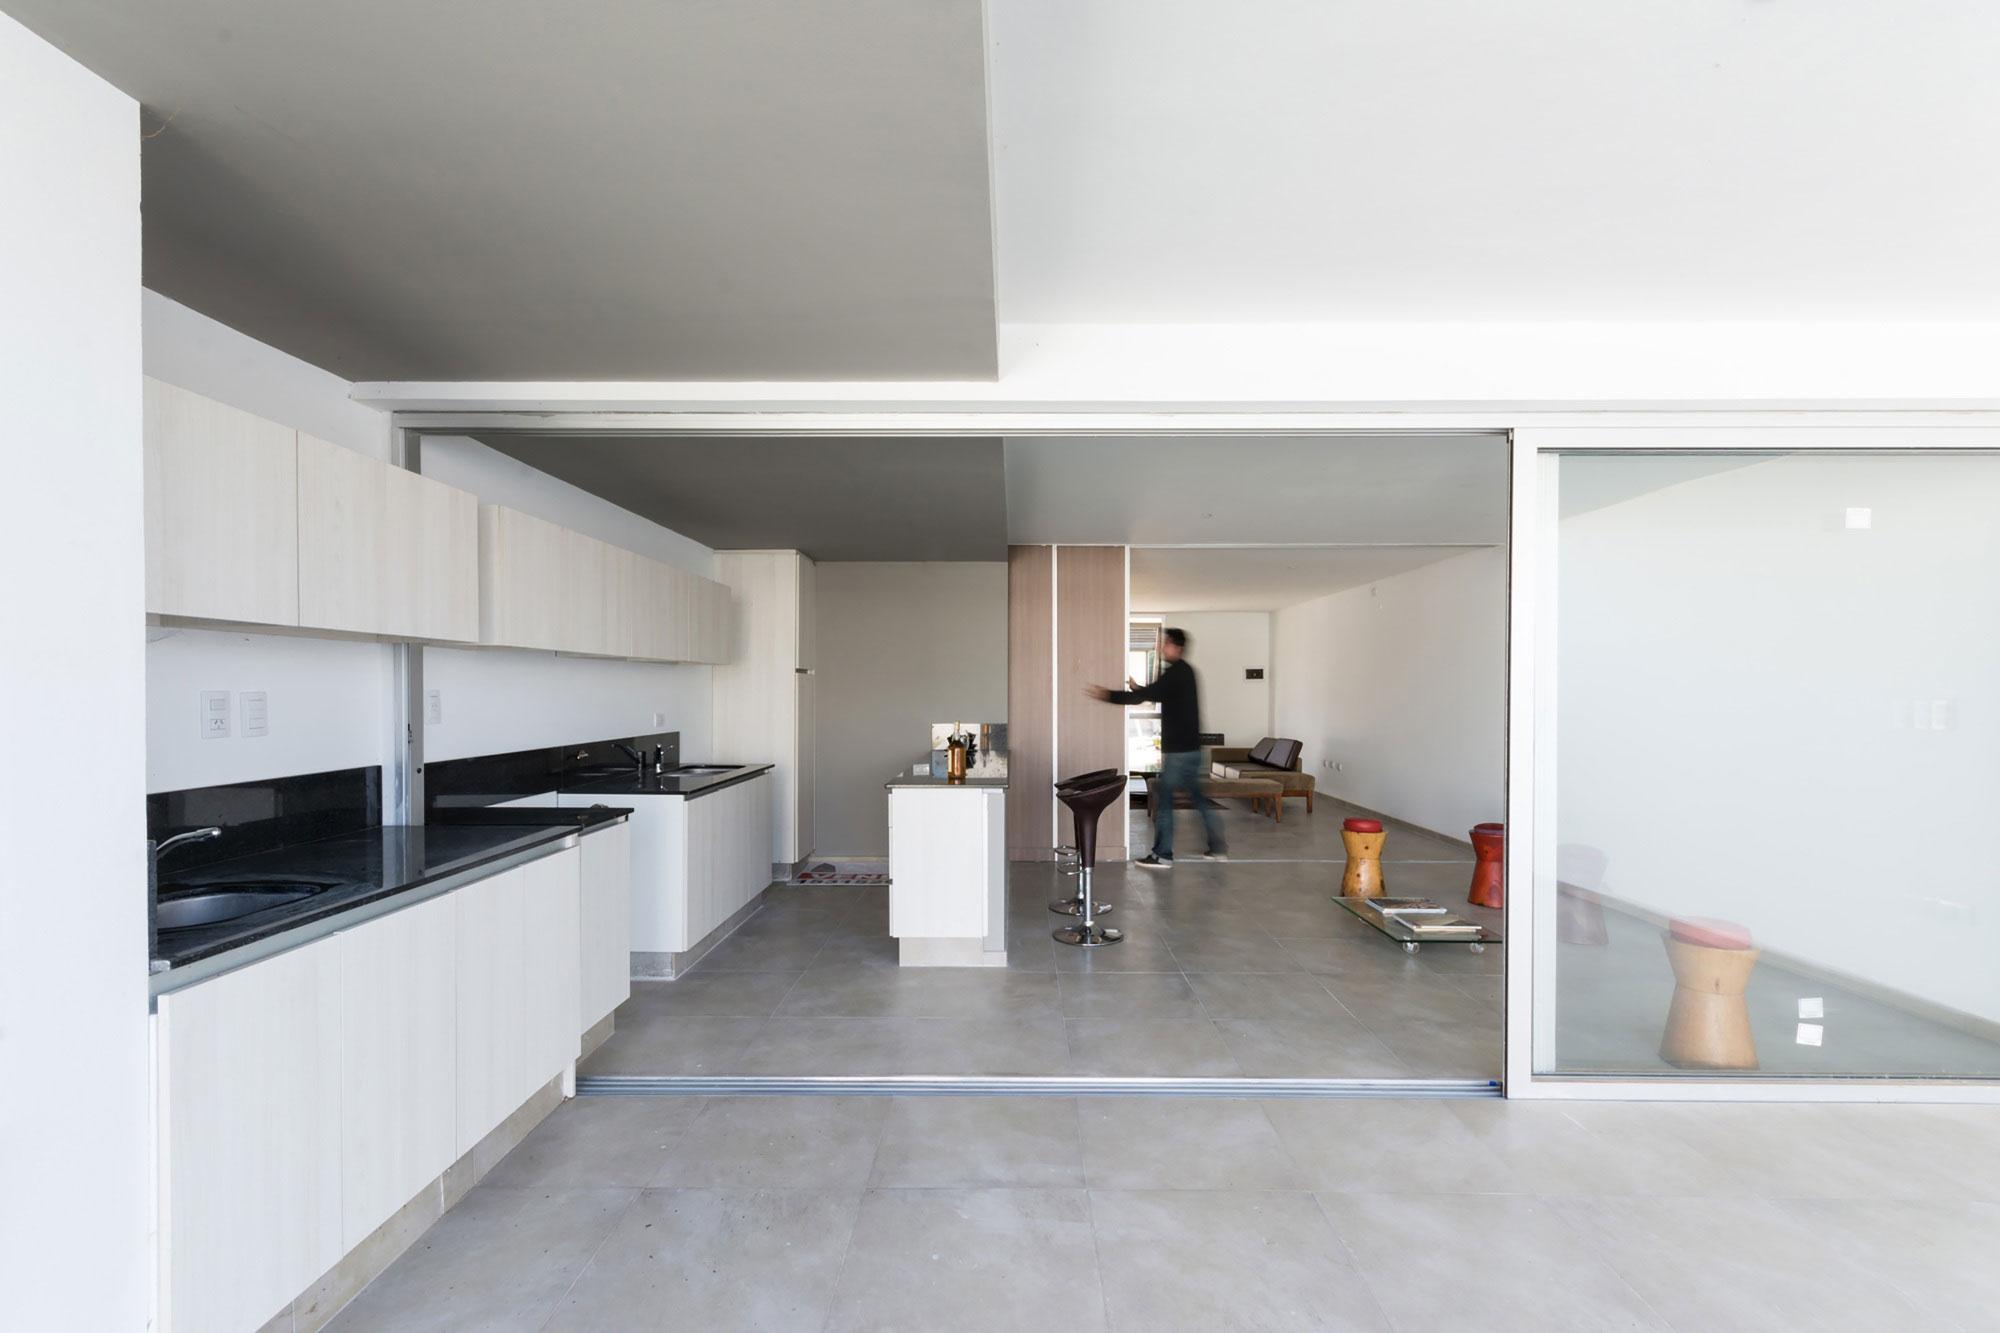 Terraced Houses-Estudio A+3-08